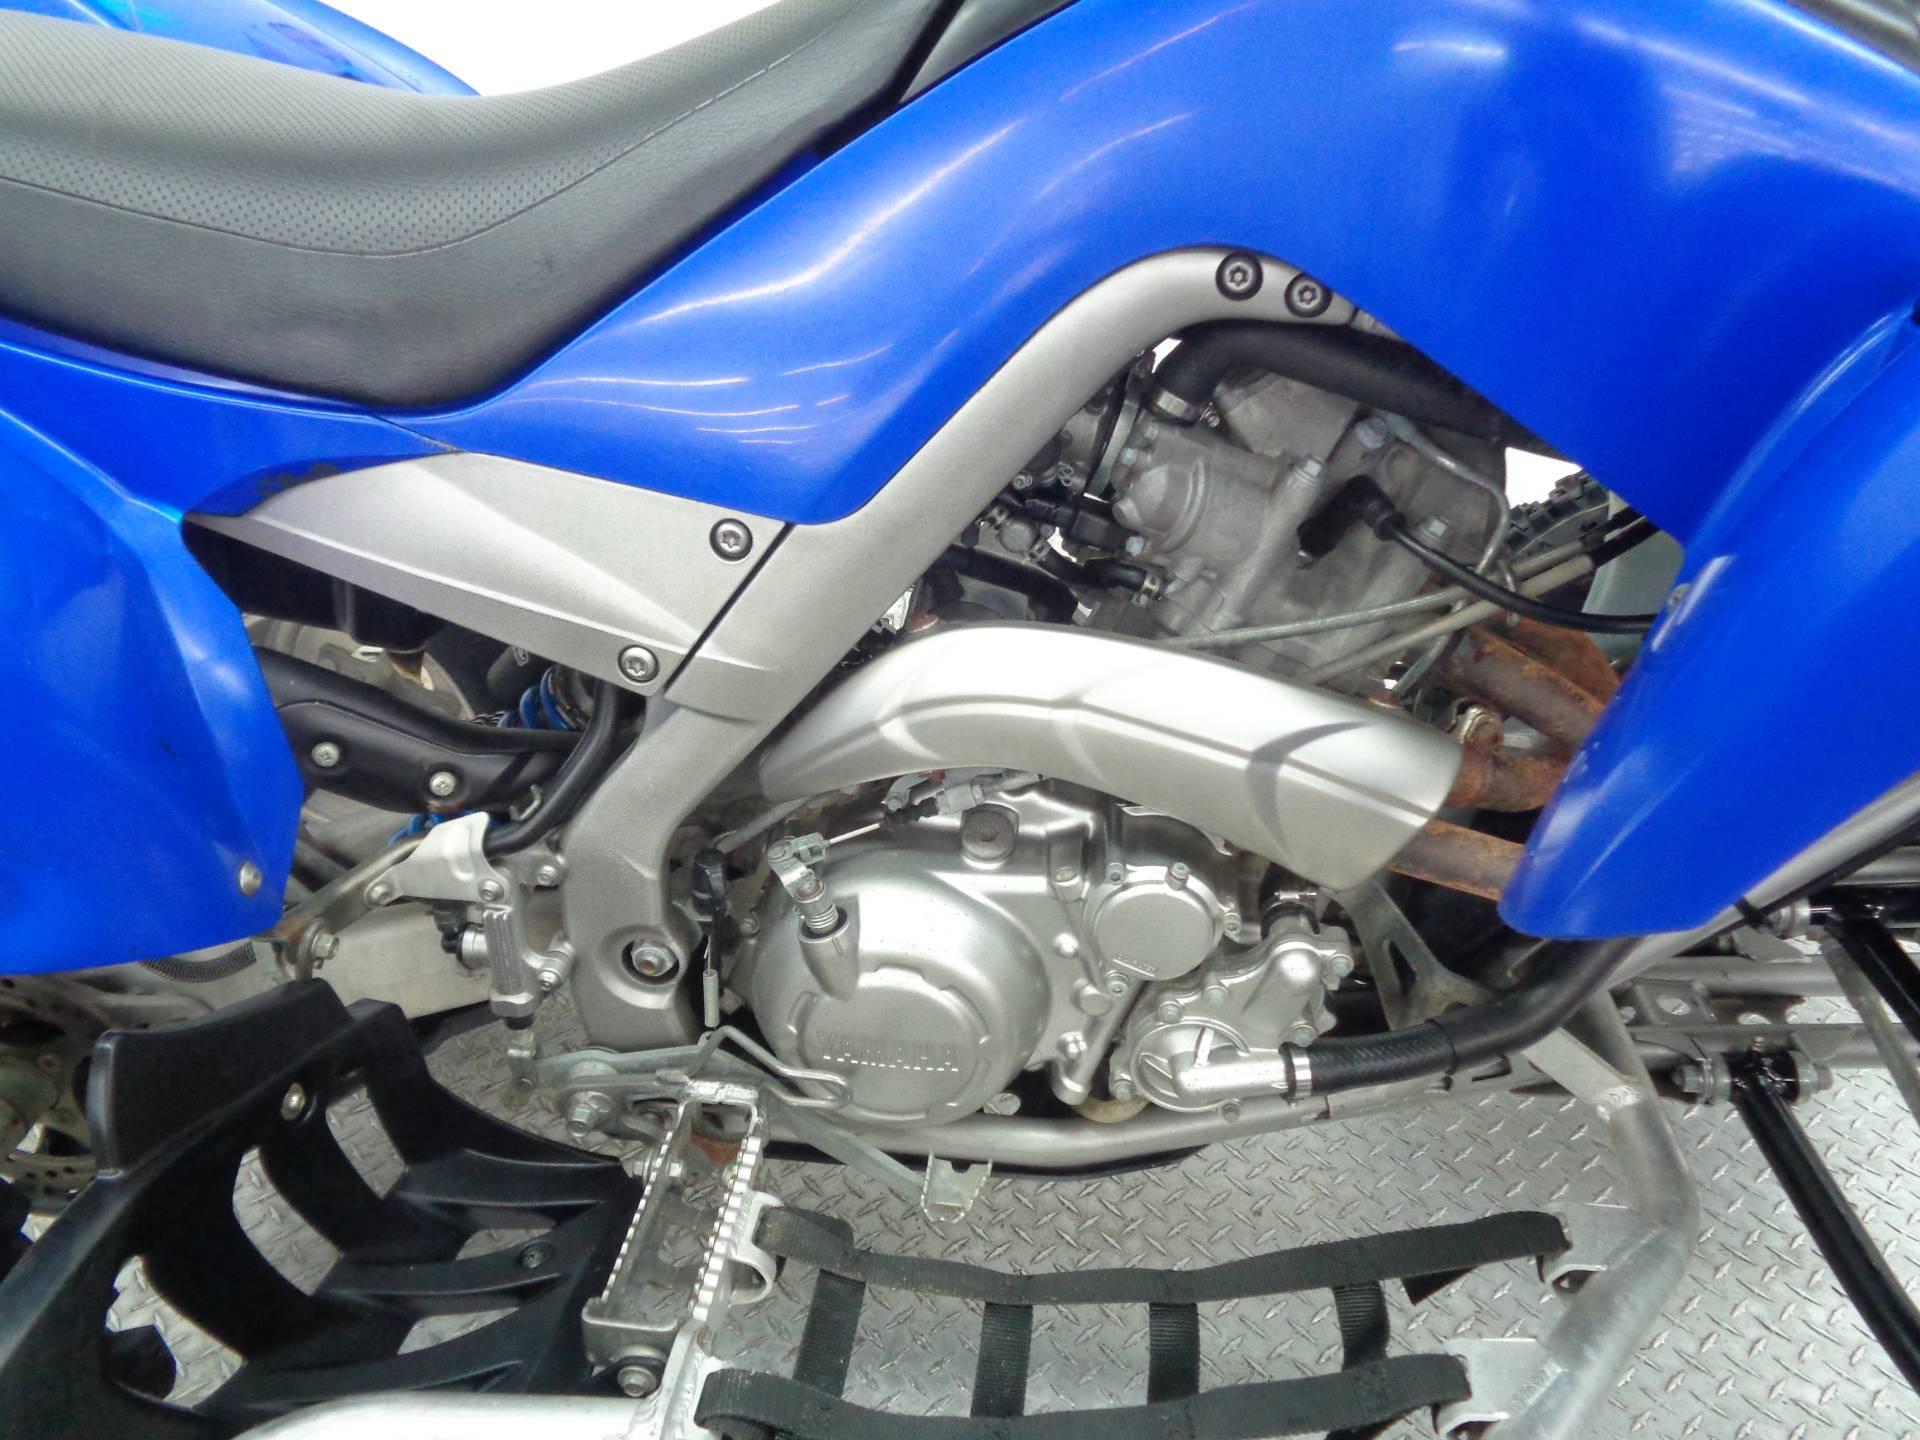 2011 Yamaha Raptor 700R 4